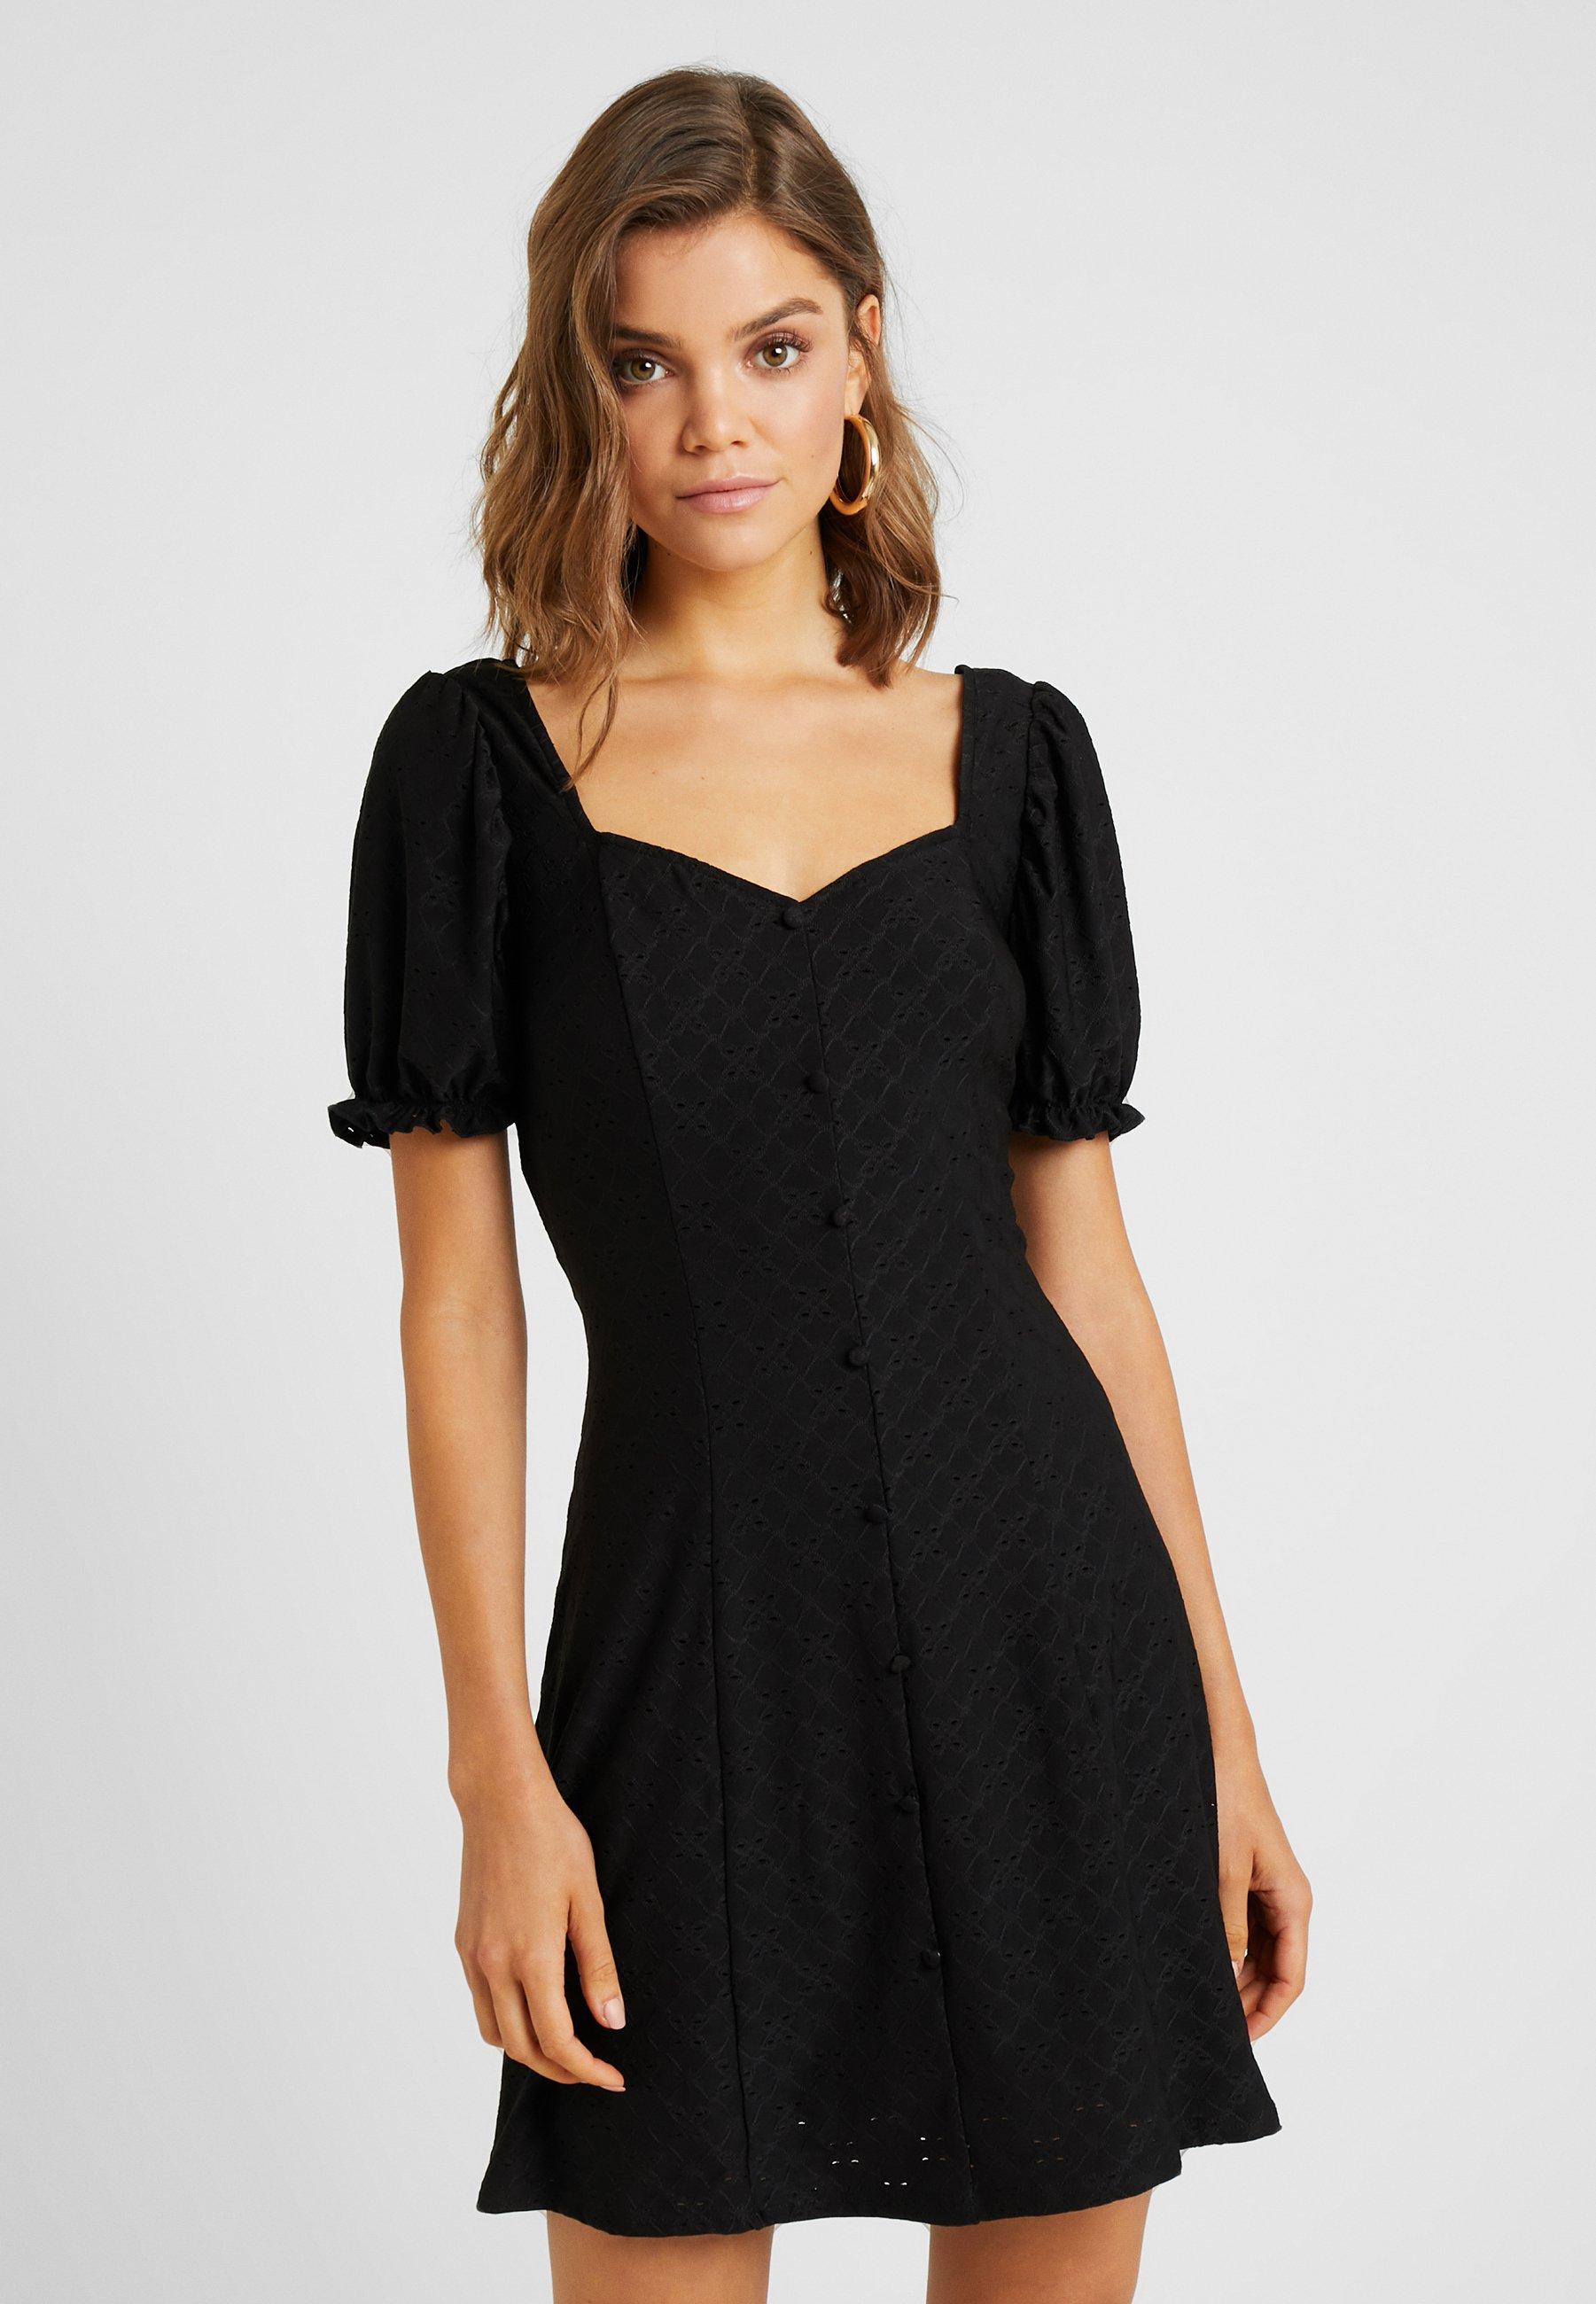 Black Button DressRobe Prairie New Look Chemise UVpSzGqM